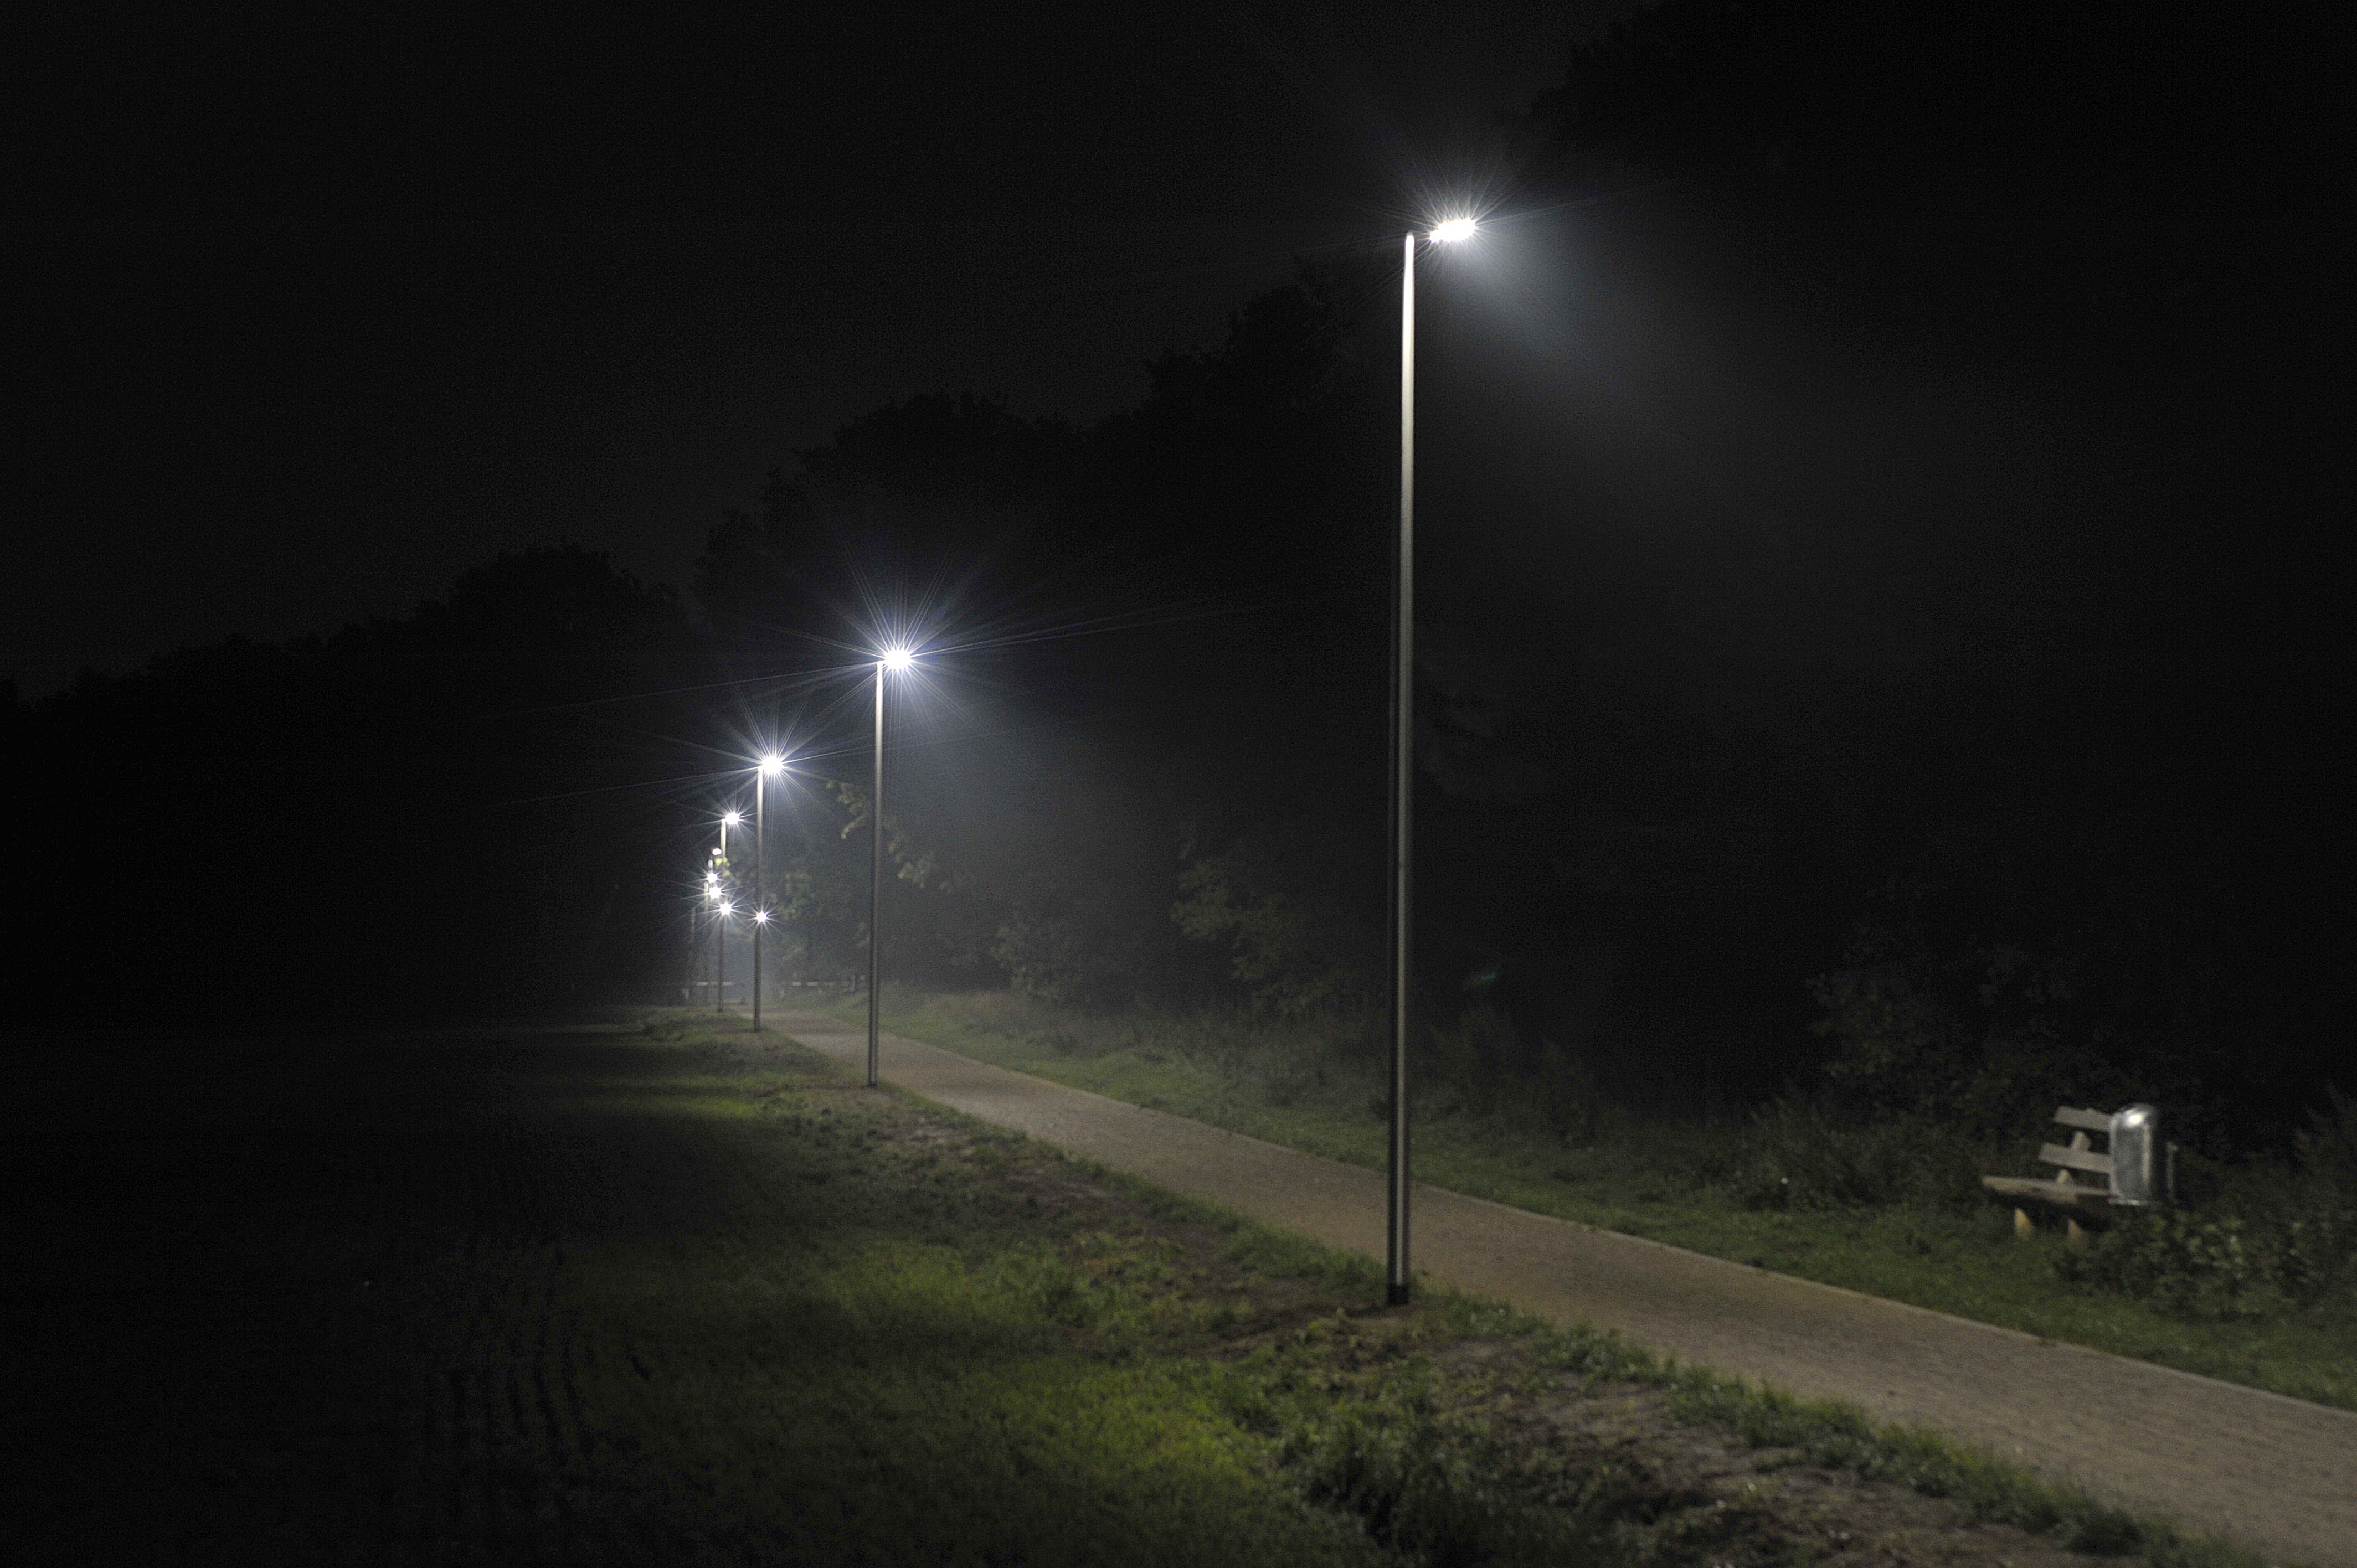 Radweg Kremperheide bei Nacht, Quelle: www.indal-gmbh.de